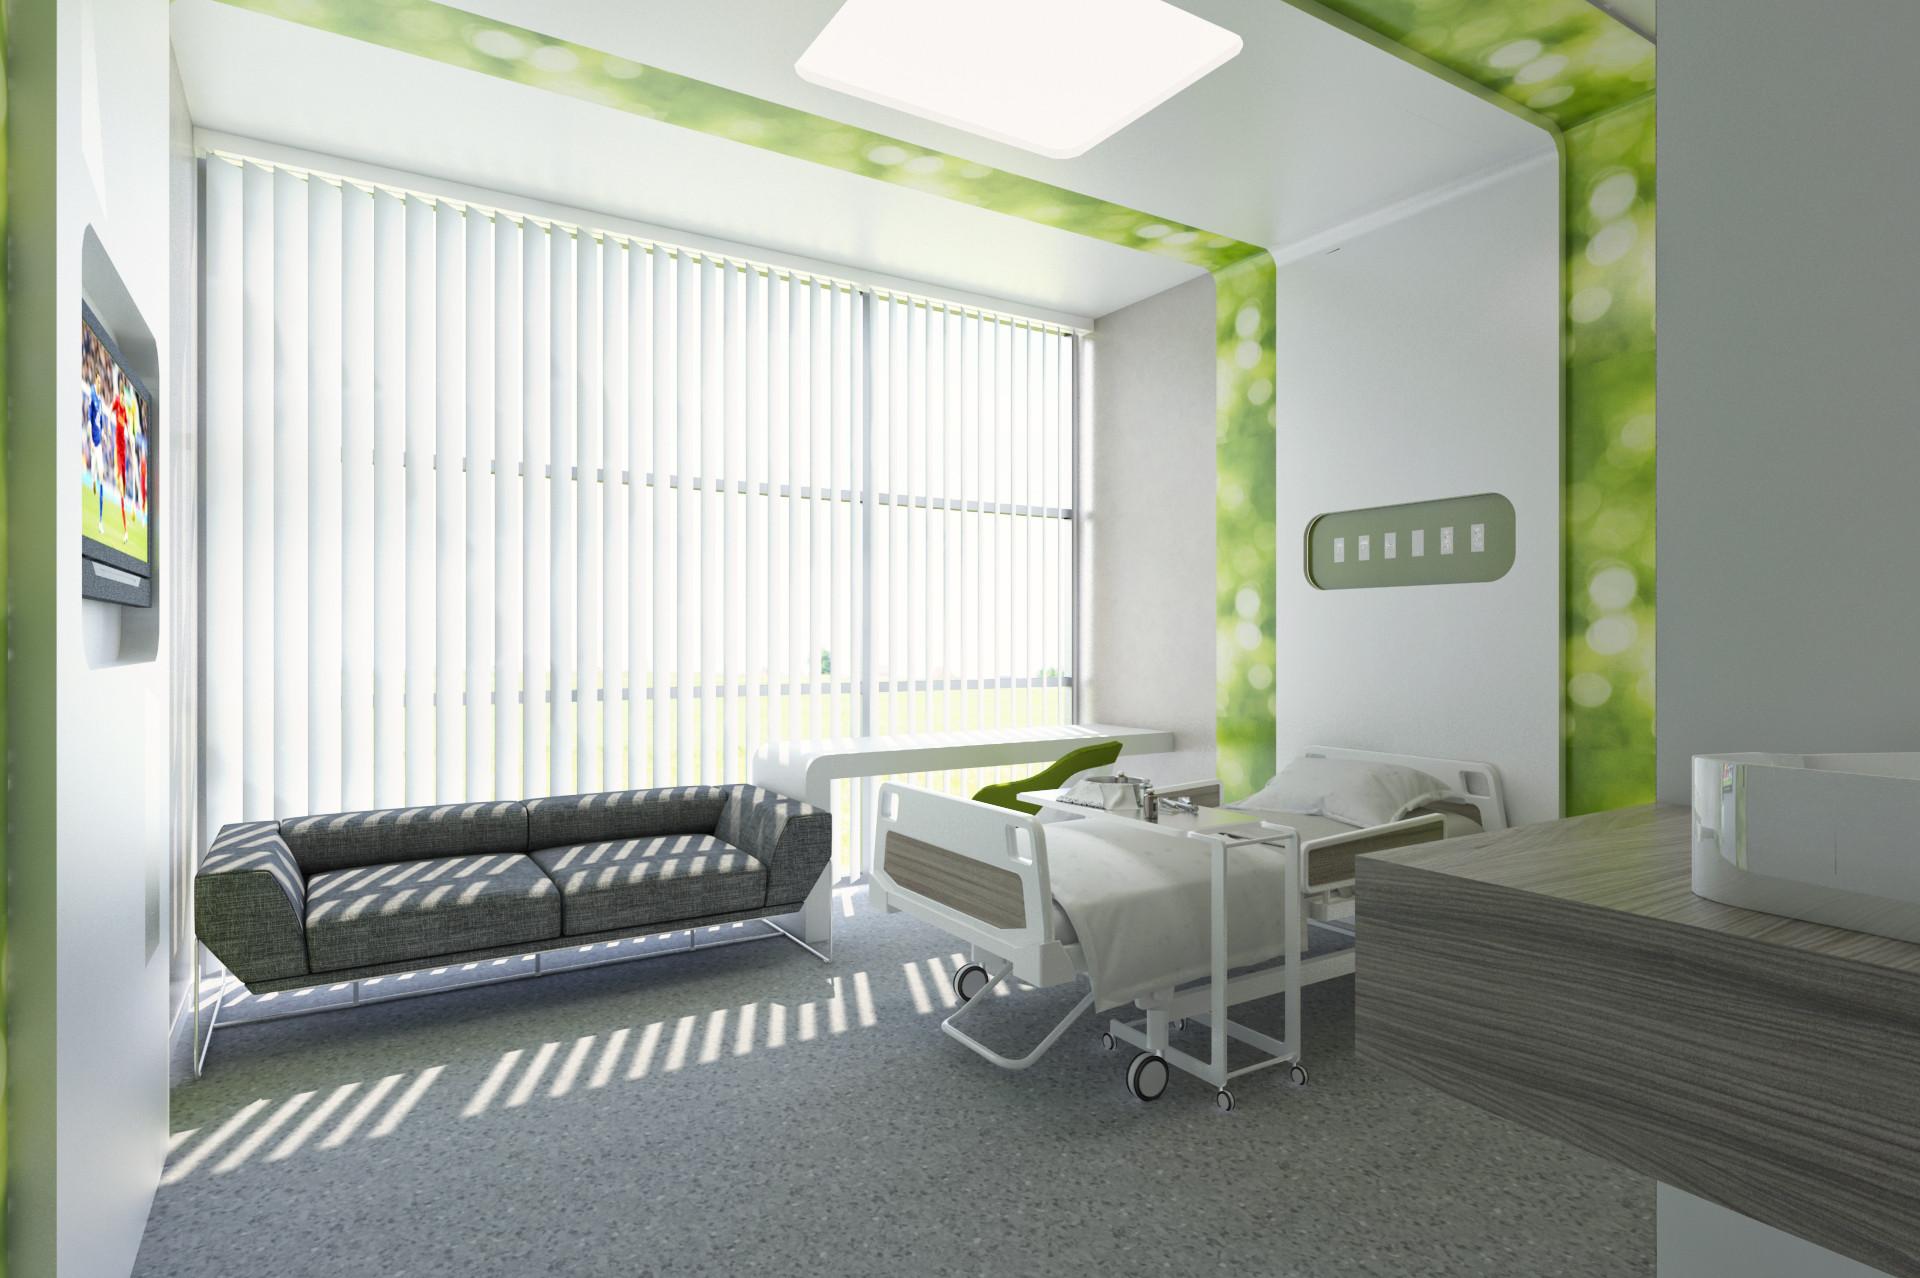 Mustafa arifoglu patient room 1